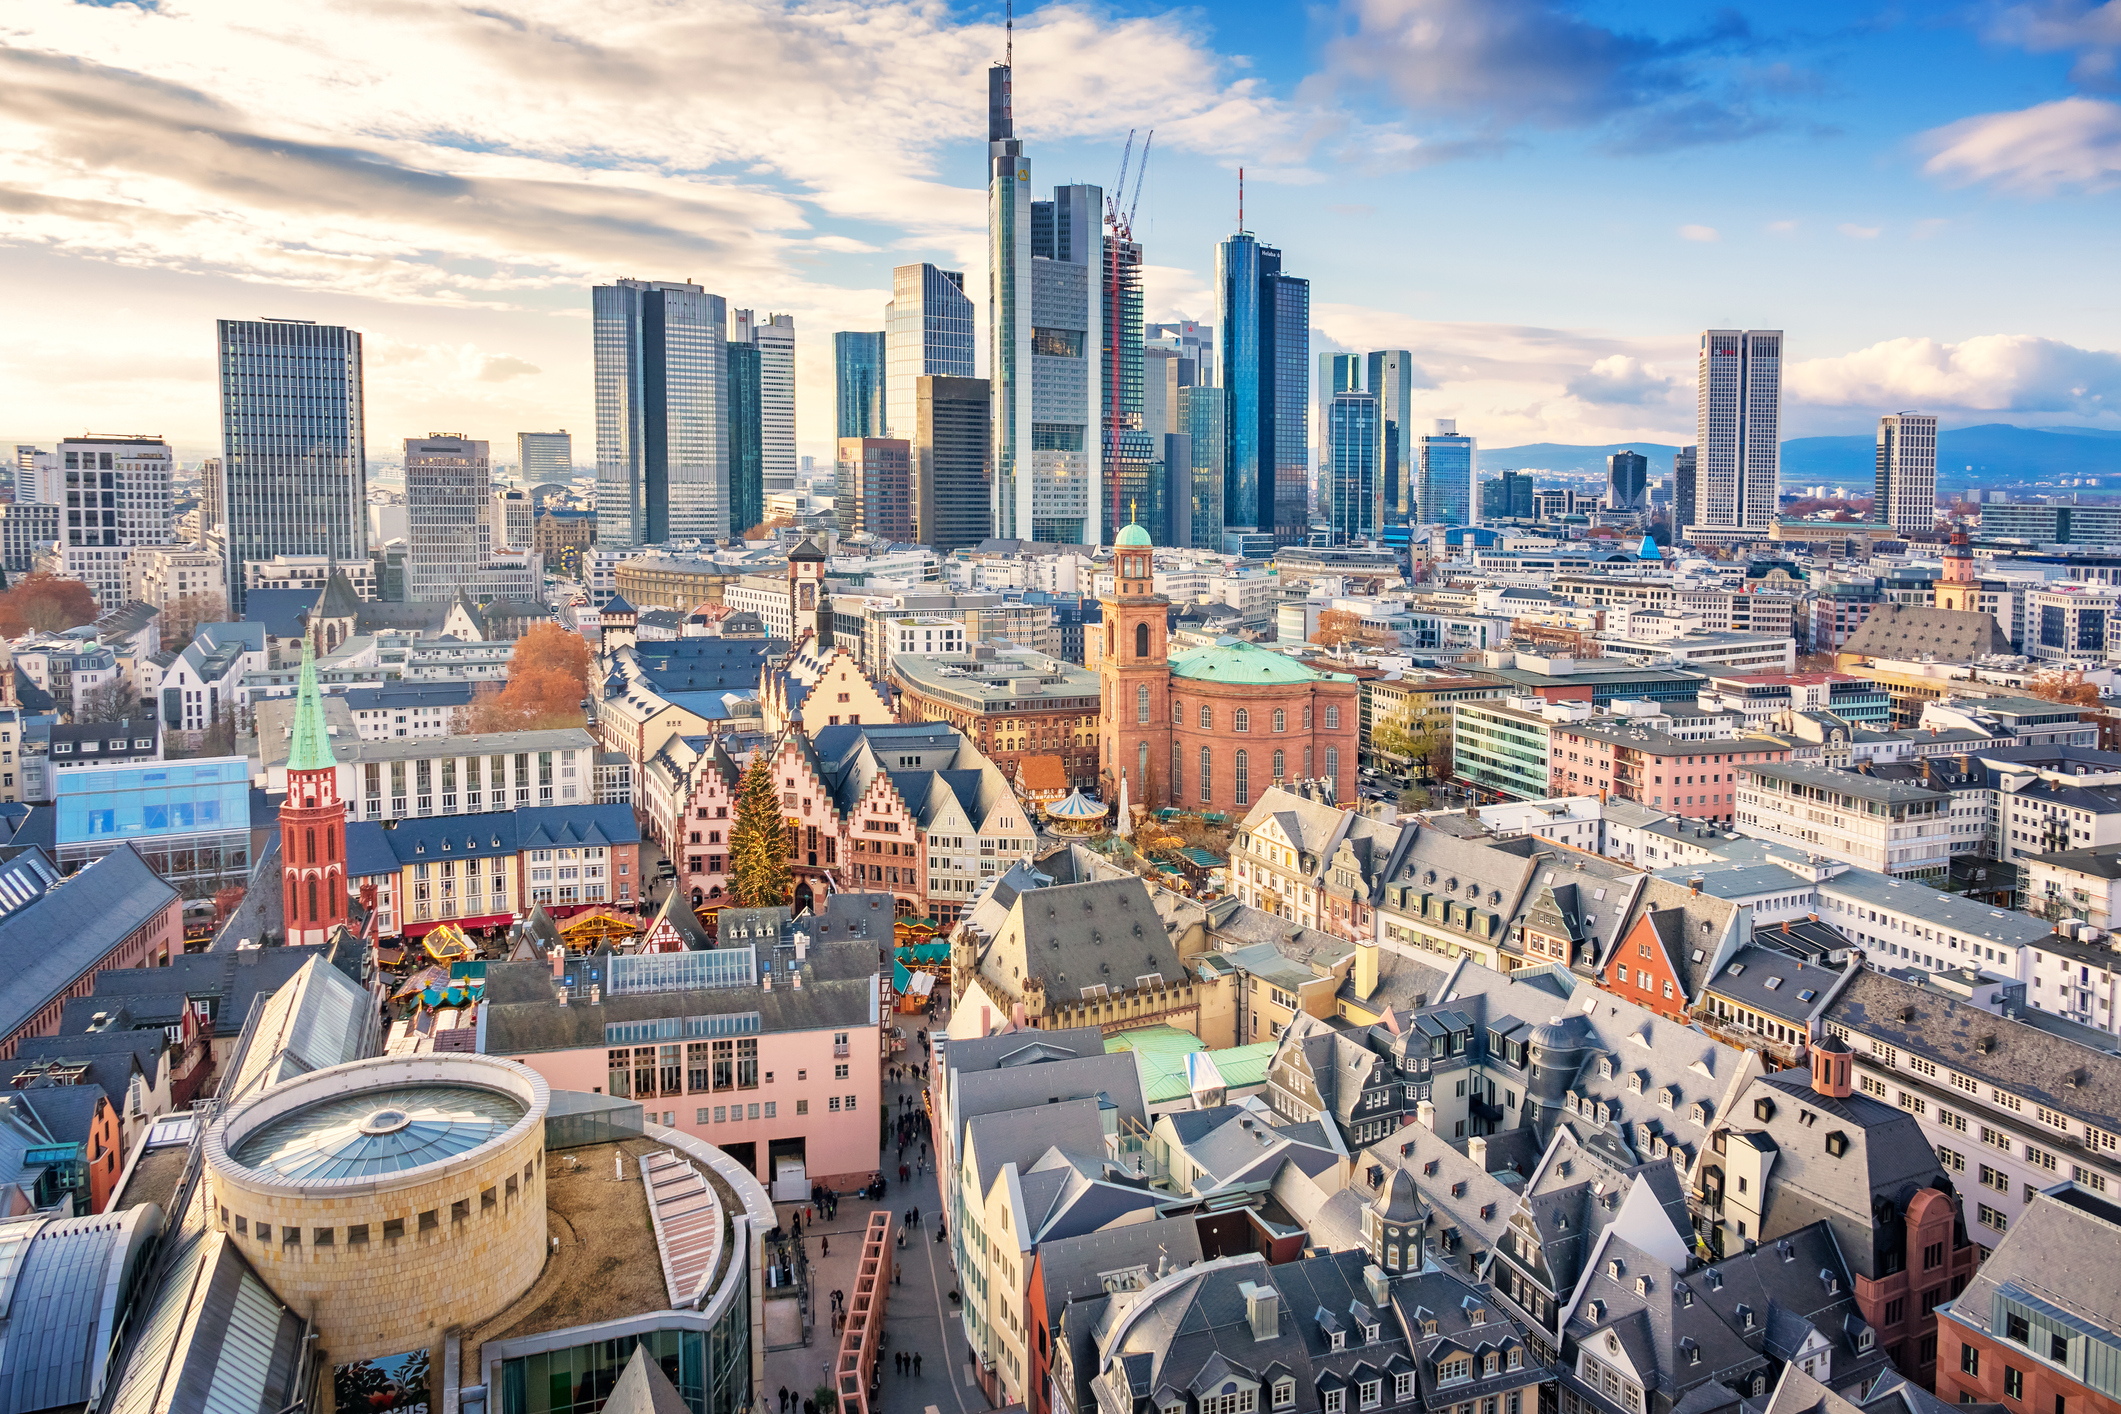 Reurbanisierung in Frankfurt